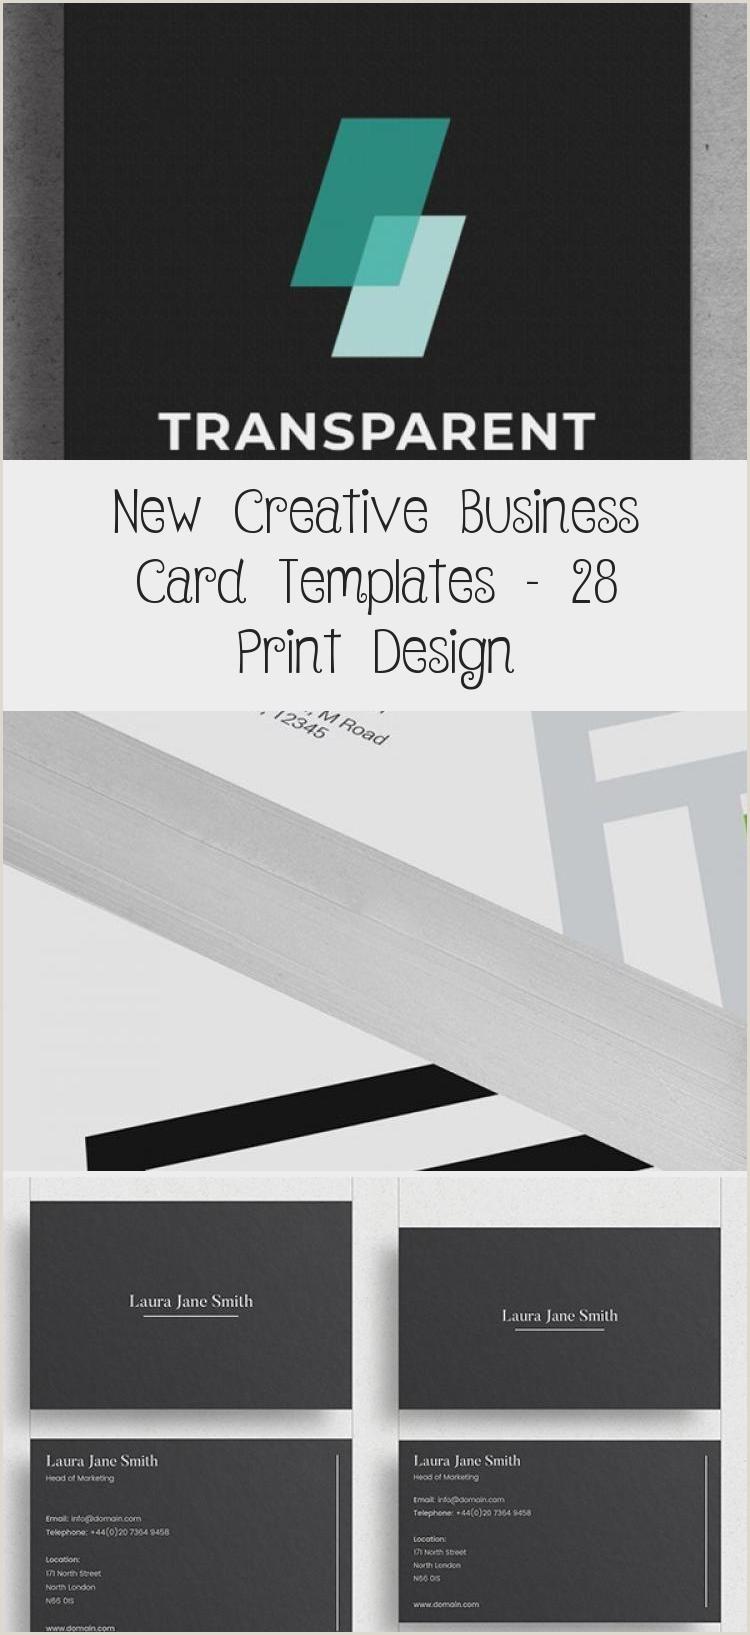 Creativebusiness New Creative Business Card Templates – 28 Print Design In